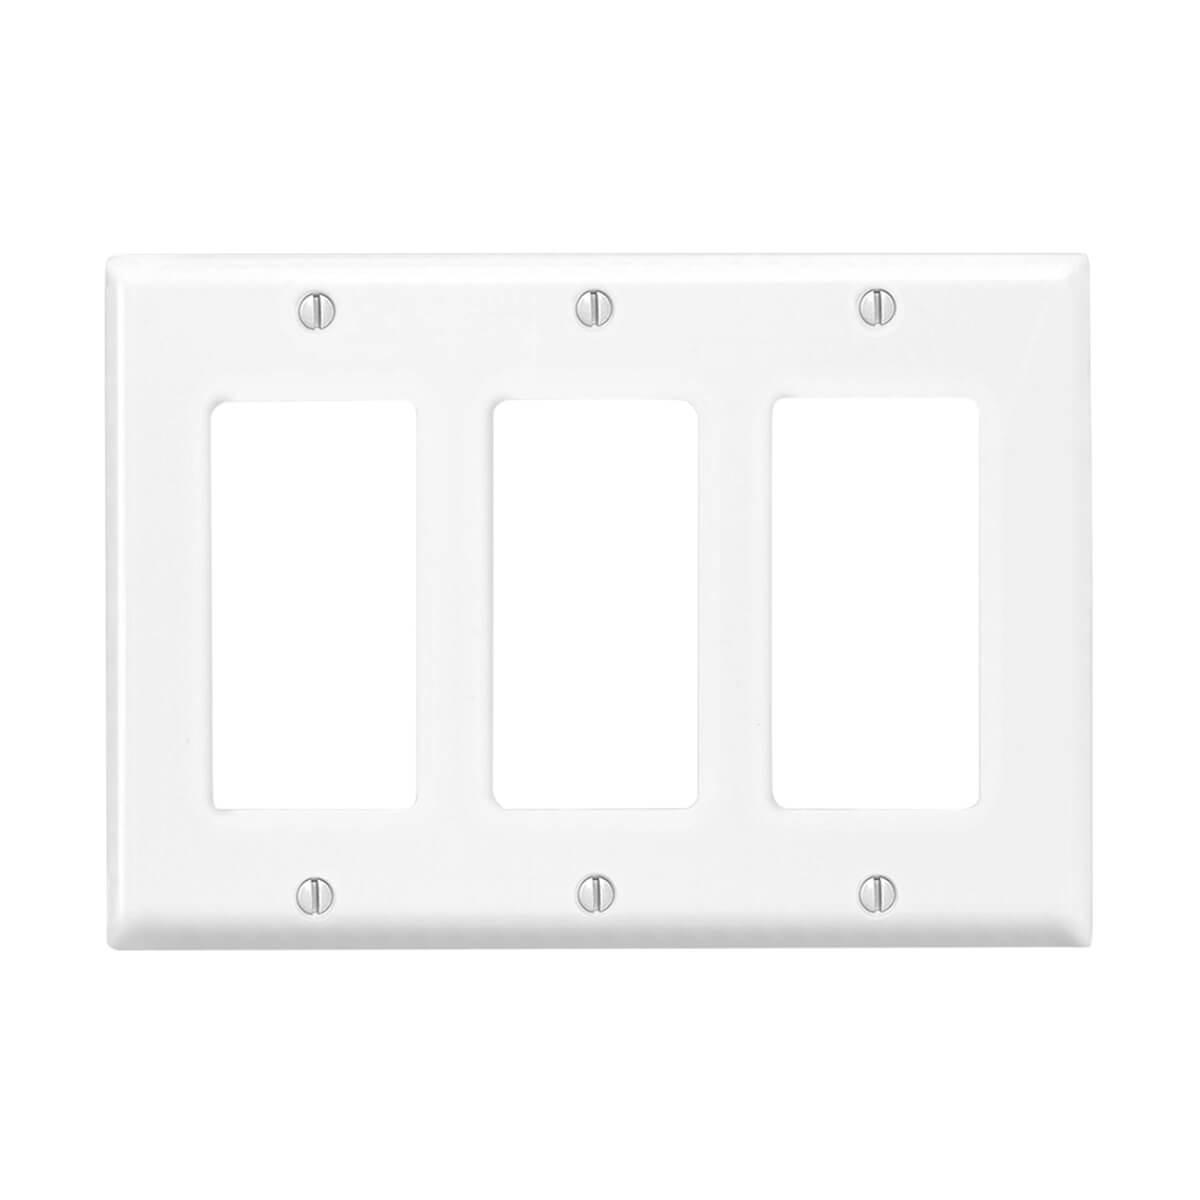 Leviton® Decora 3-Gang Wall Plate - White